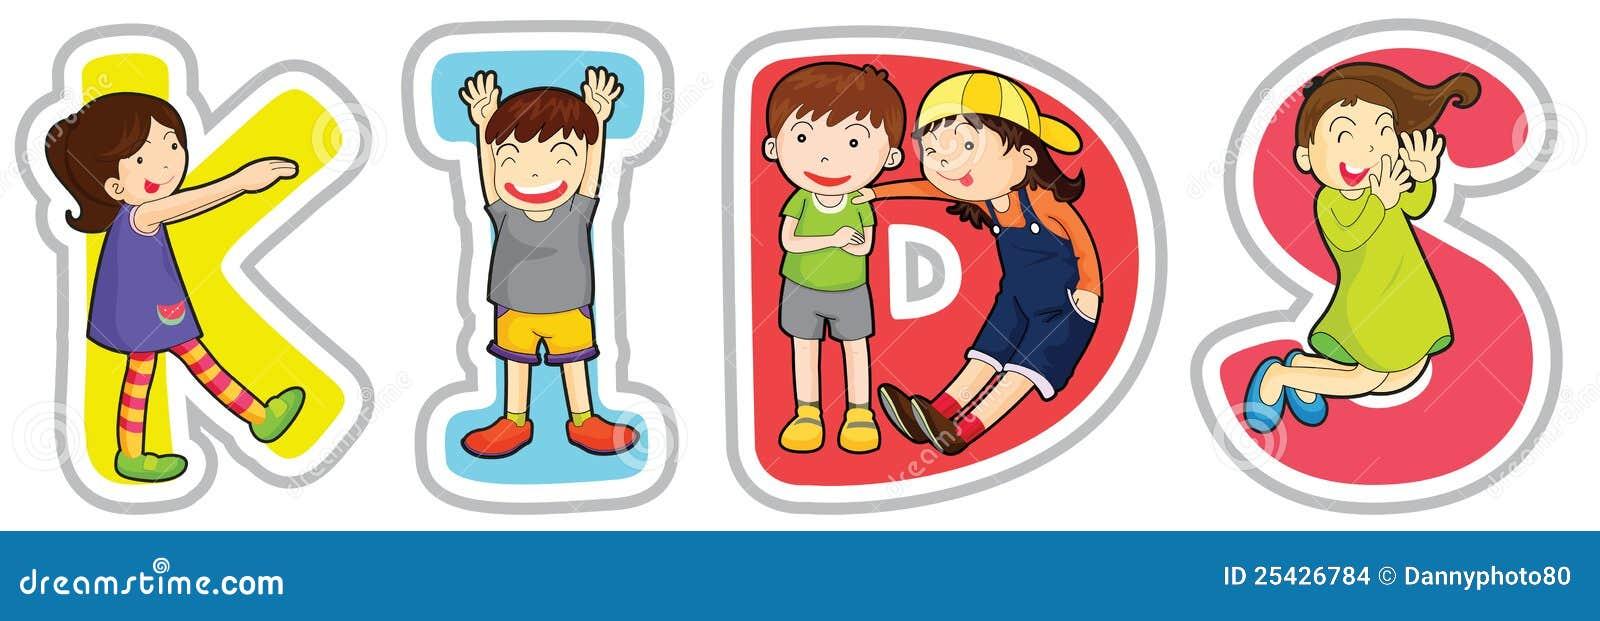 English word kids stock illustration. Illustration of ...